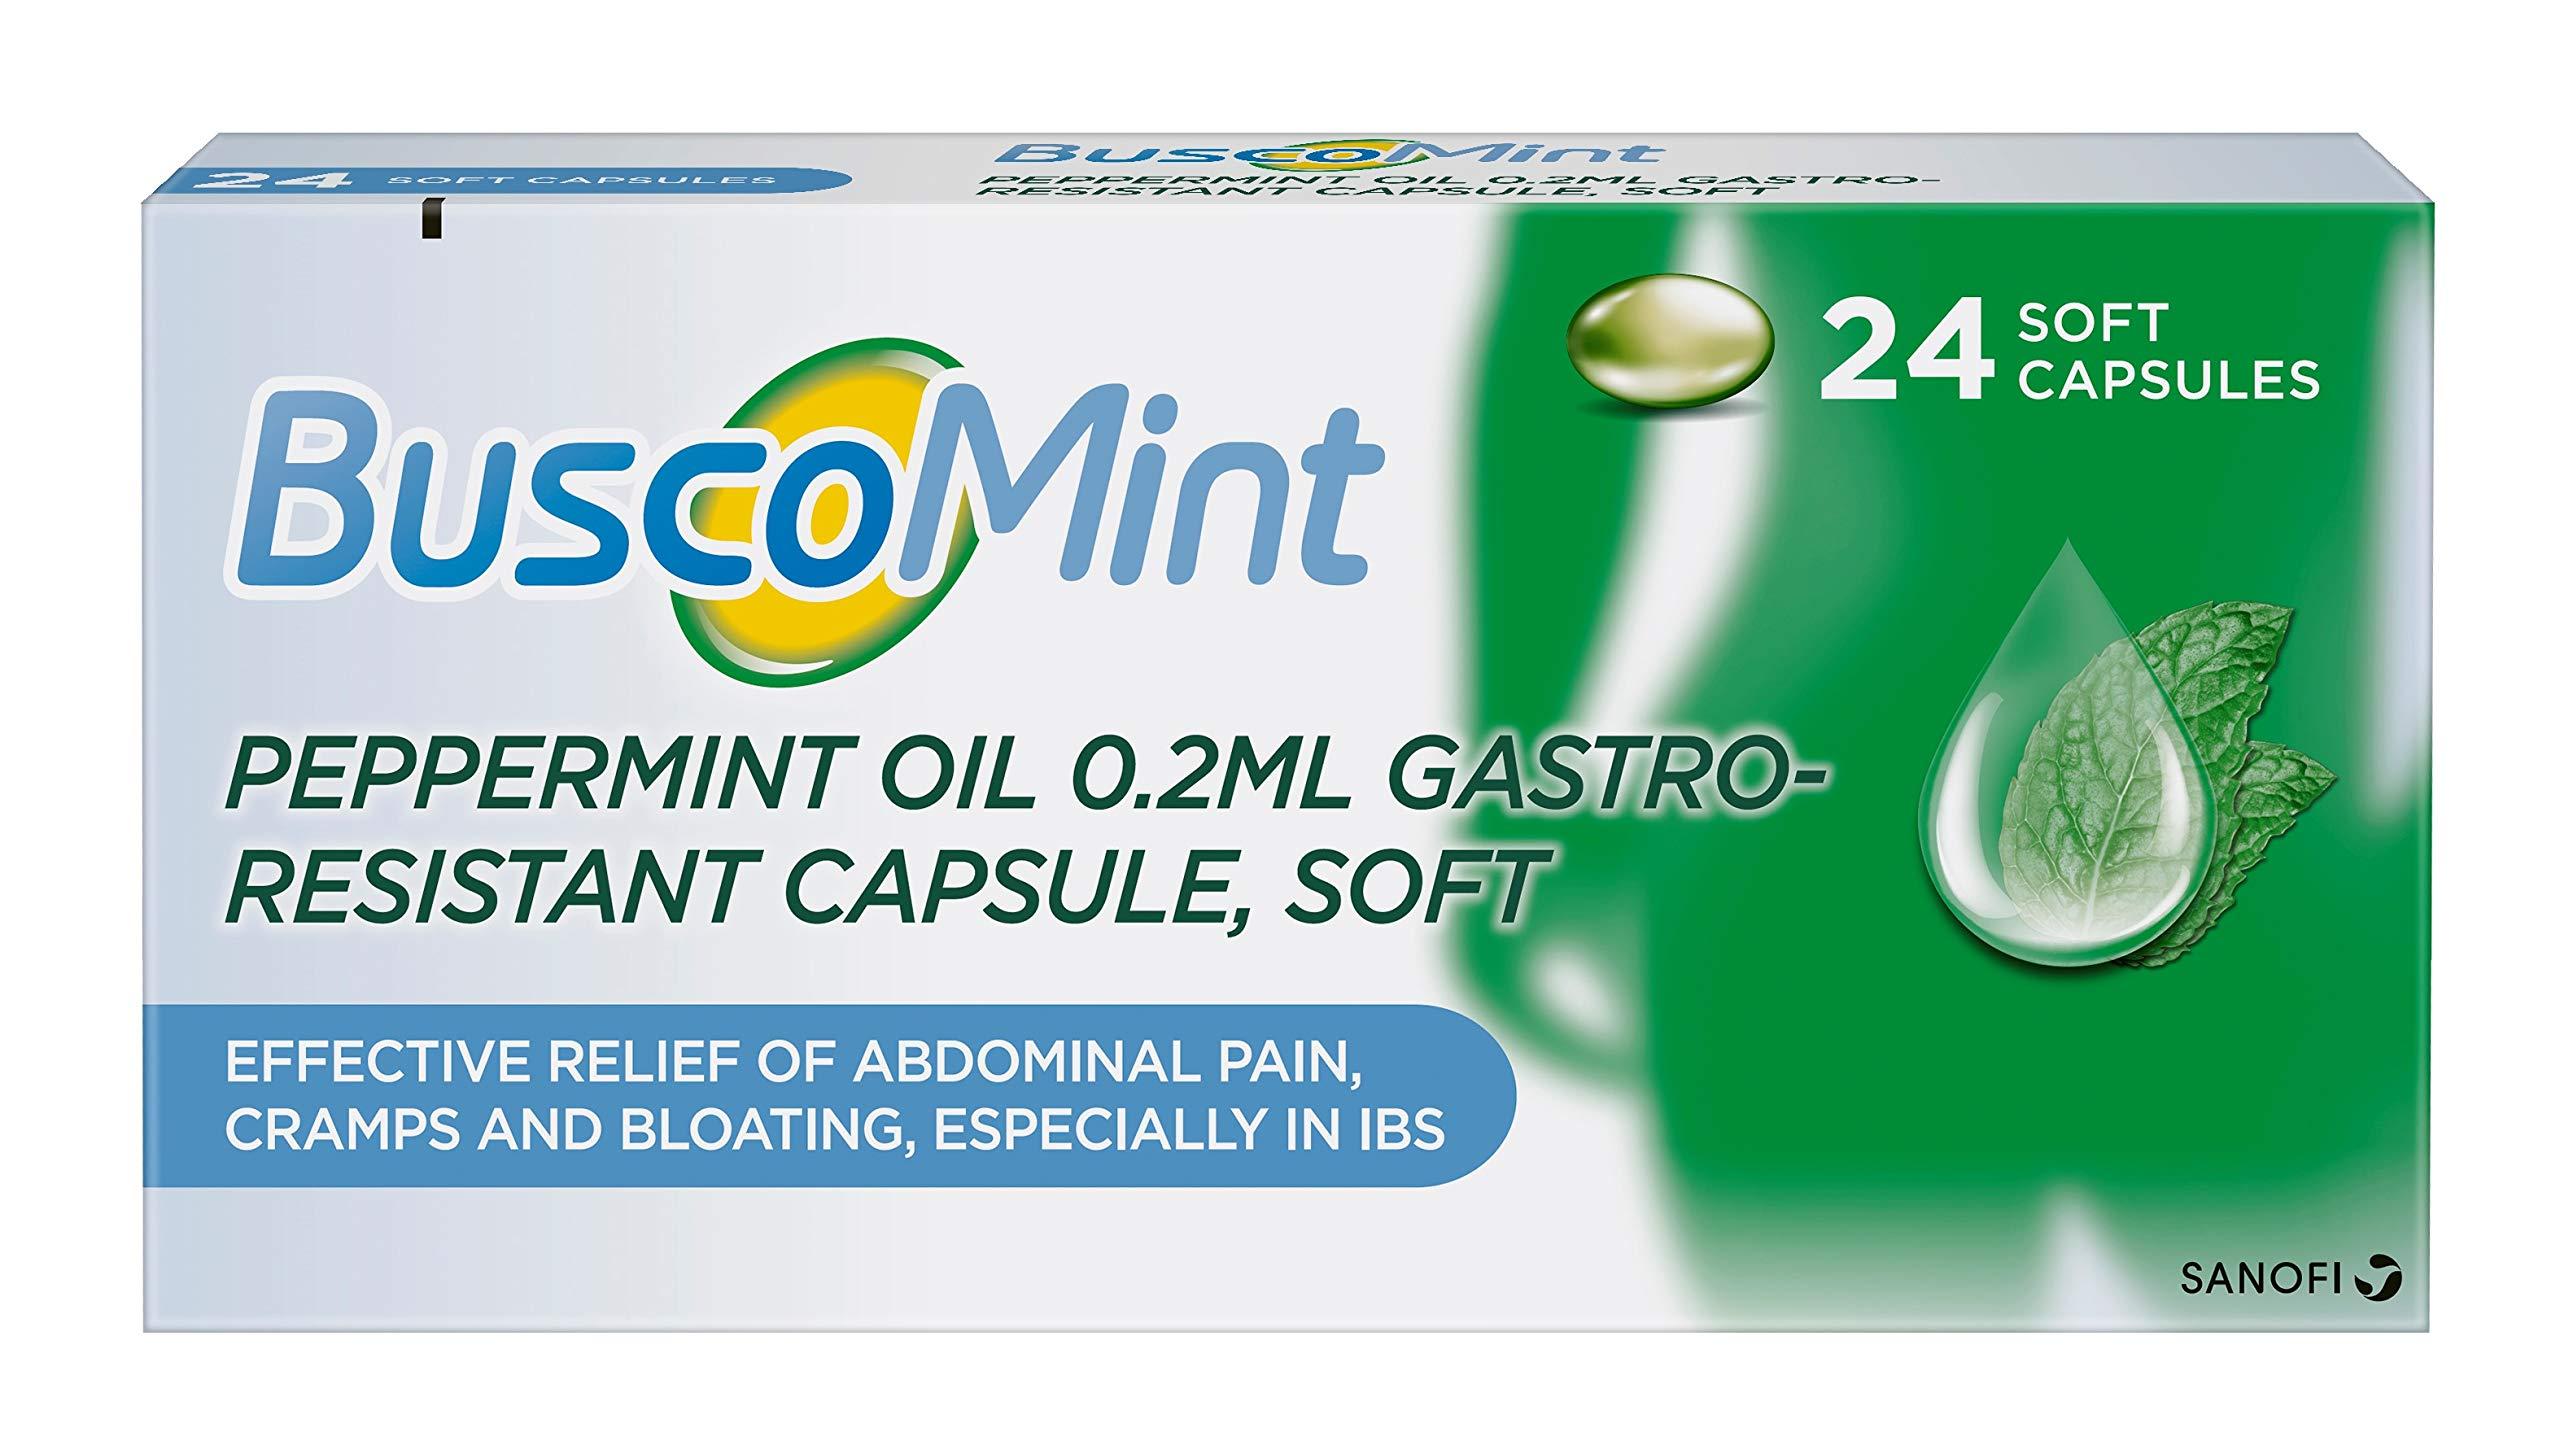 Buscopan Buscomint 0.2 ml Peppermint Oil IBS MultiSymptom Treatment, Soft Gel Capsules, 24 Count